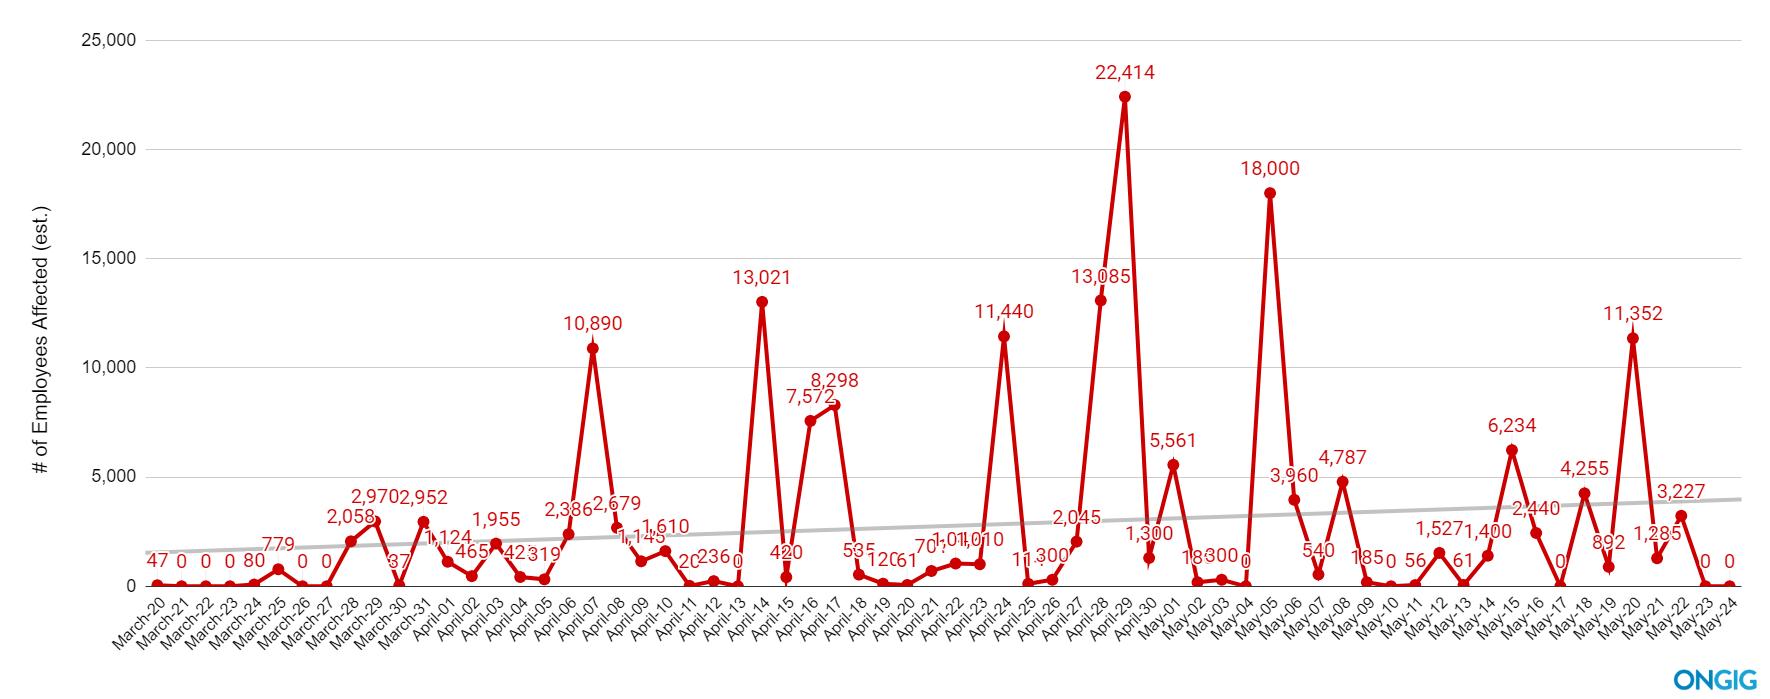 covid layoffs by day trendline